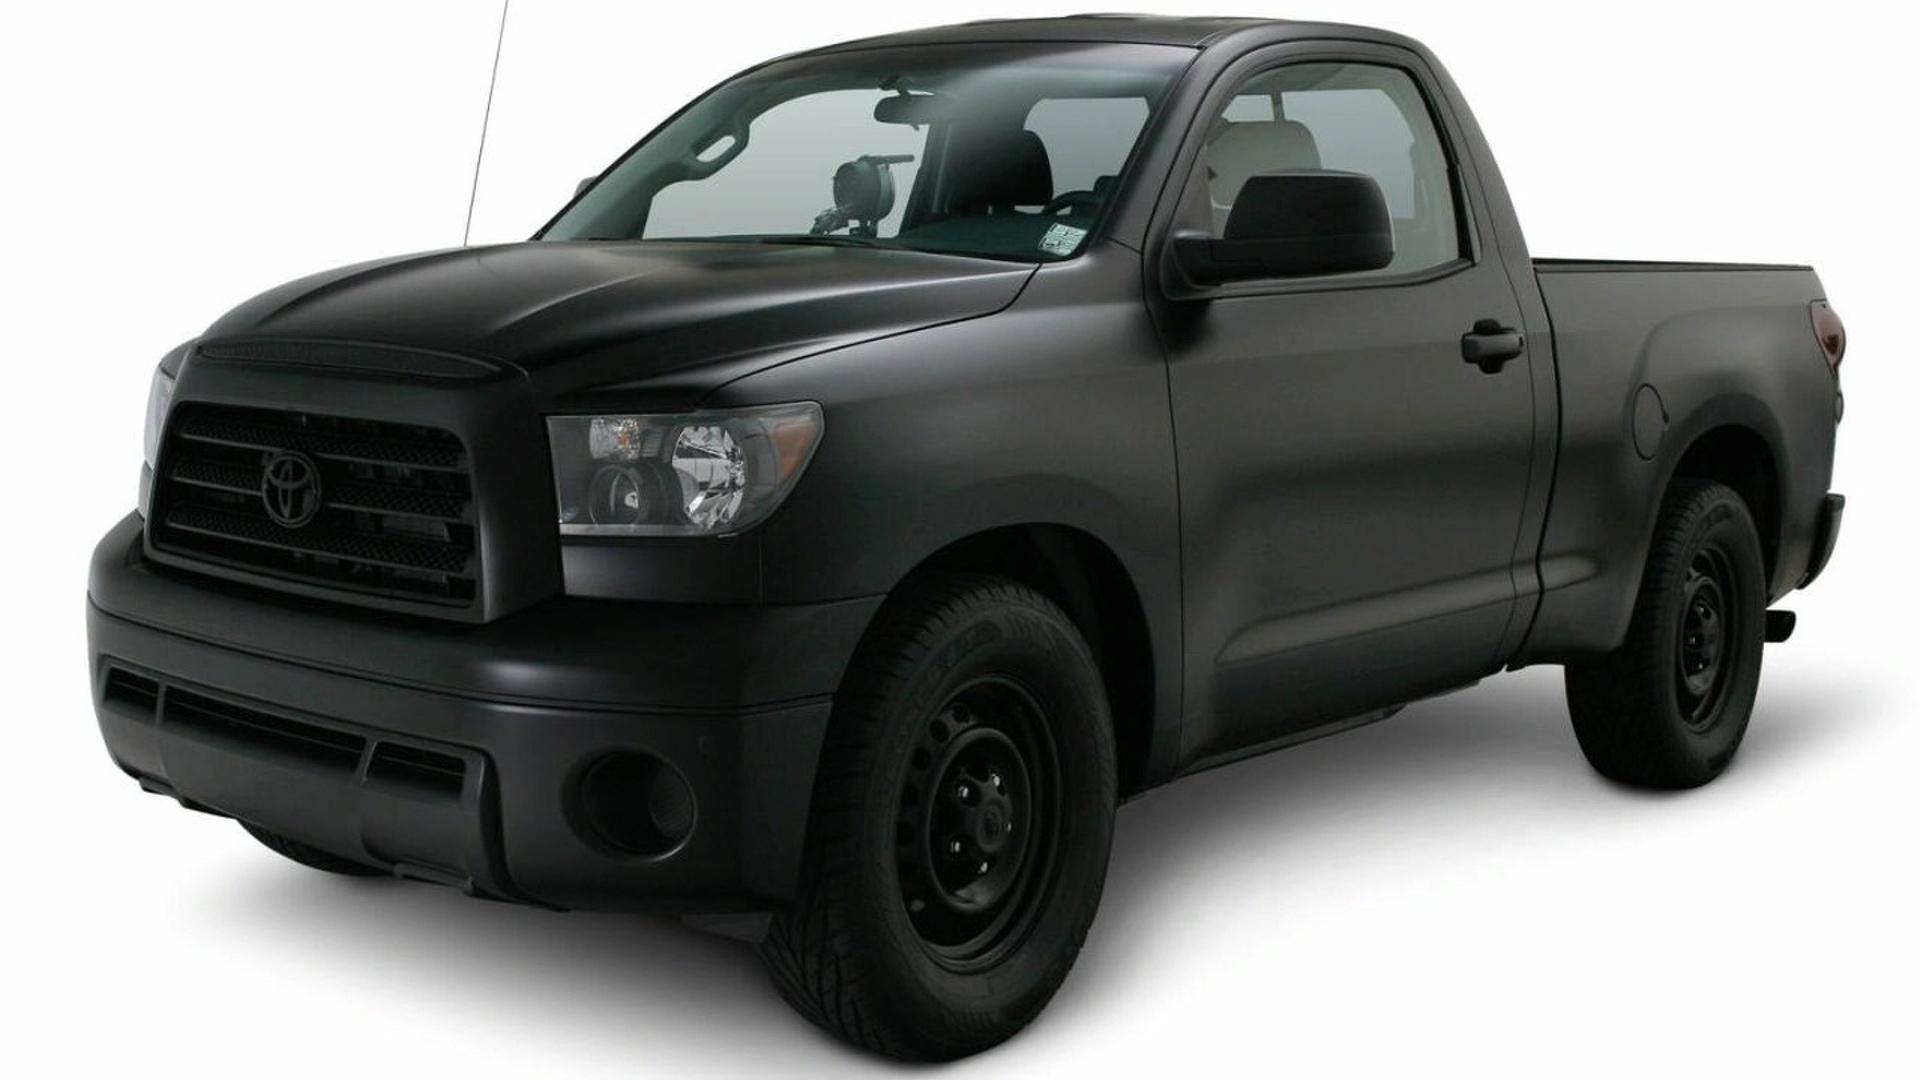 2009 Toyota Tundra TR Concept at SEMA